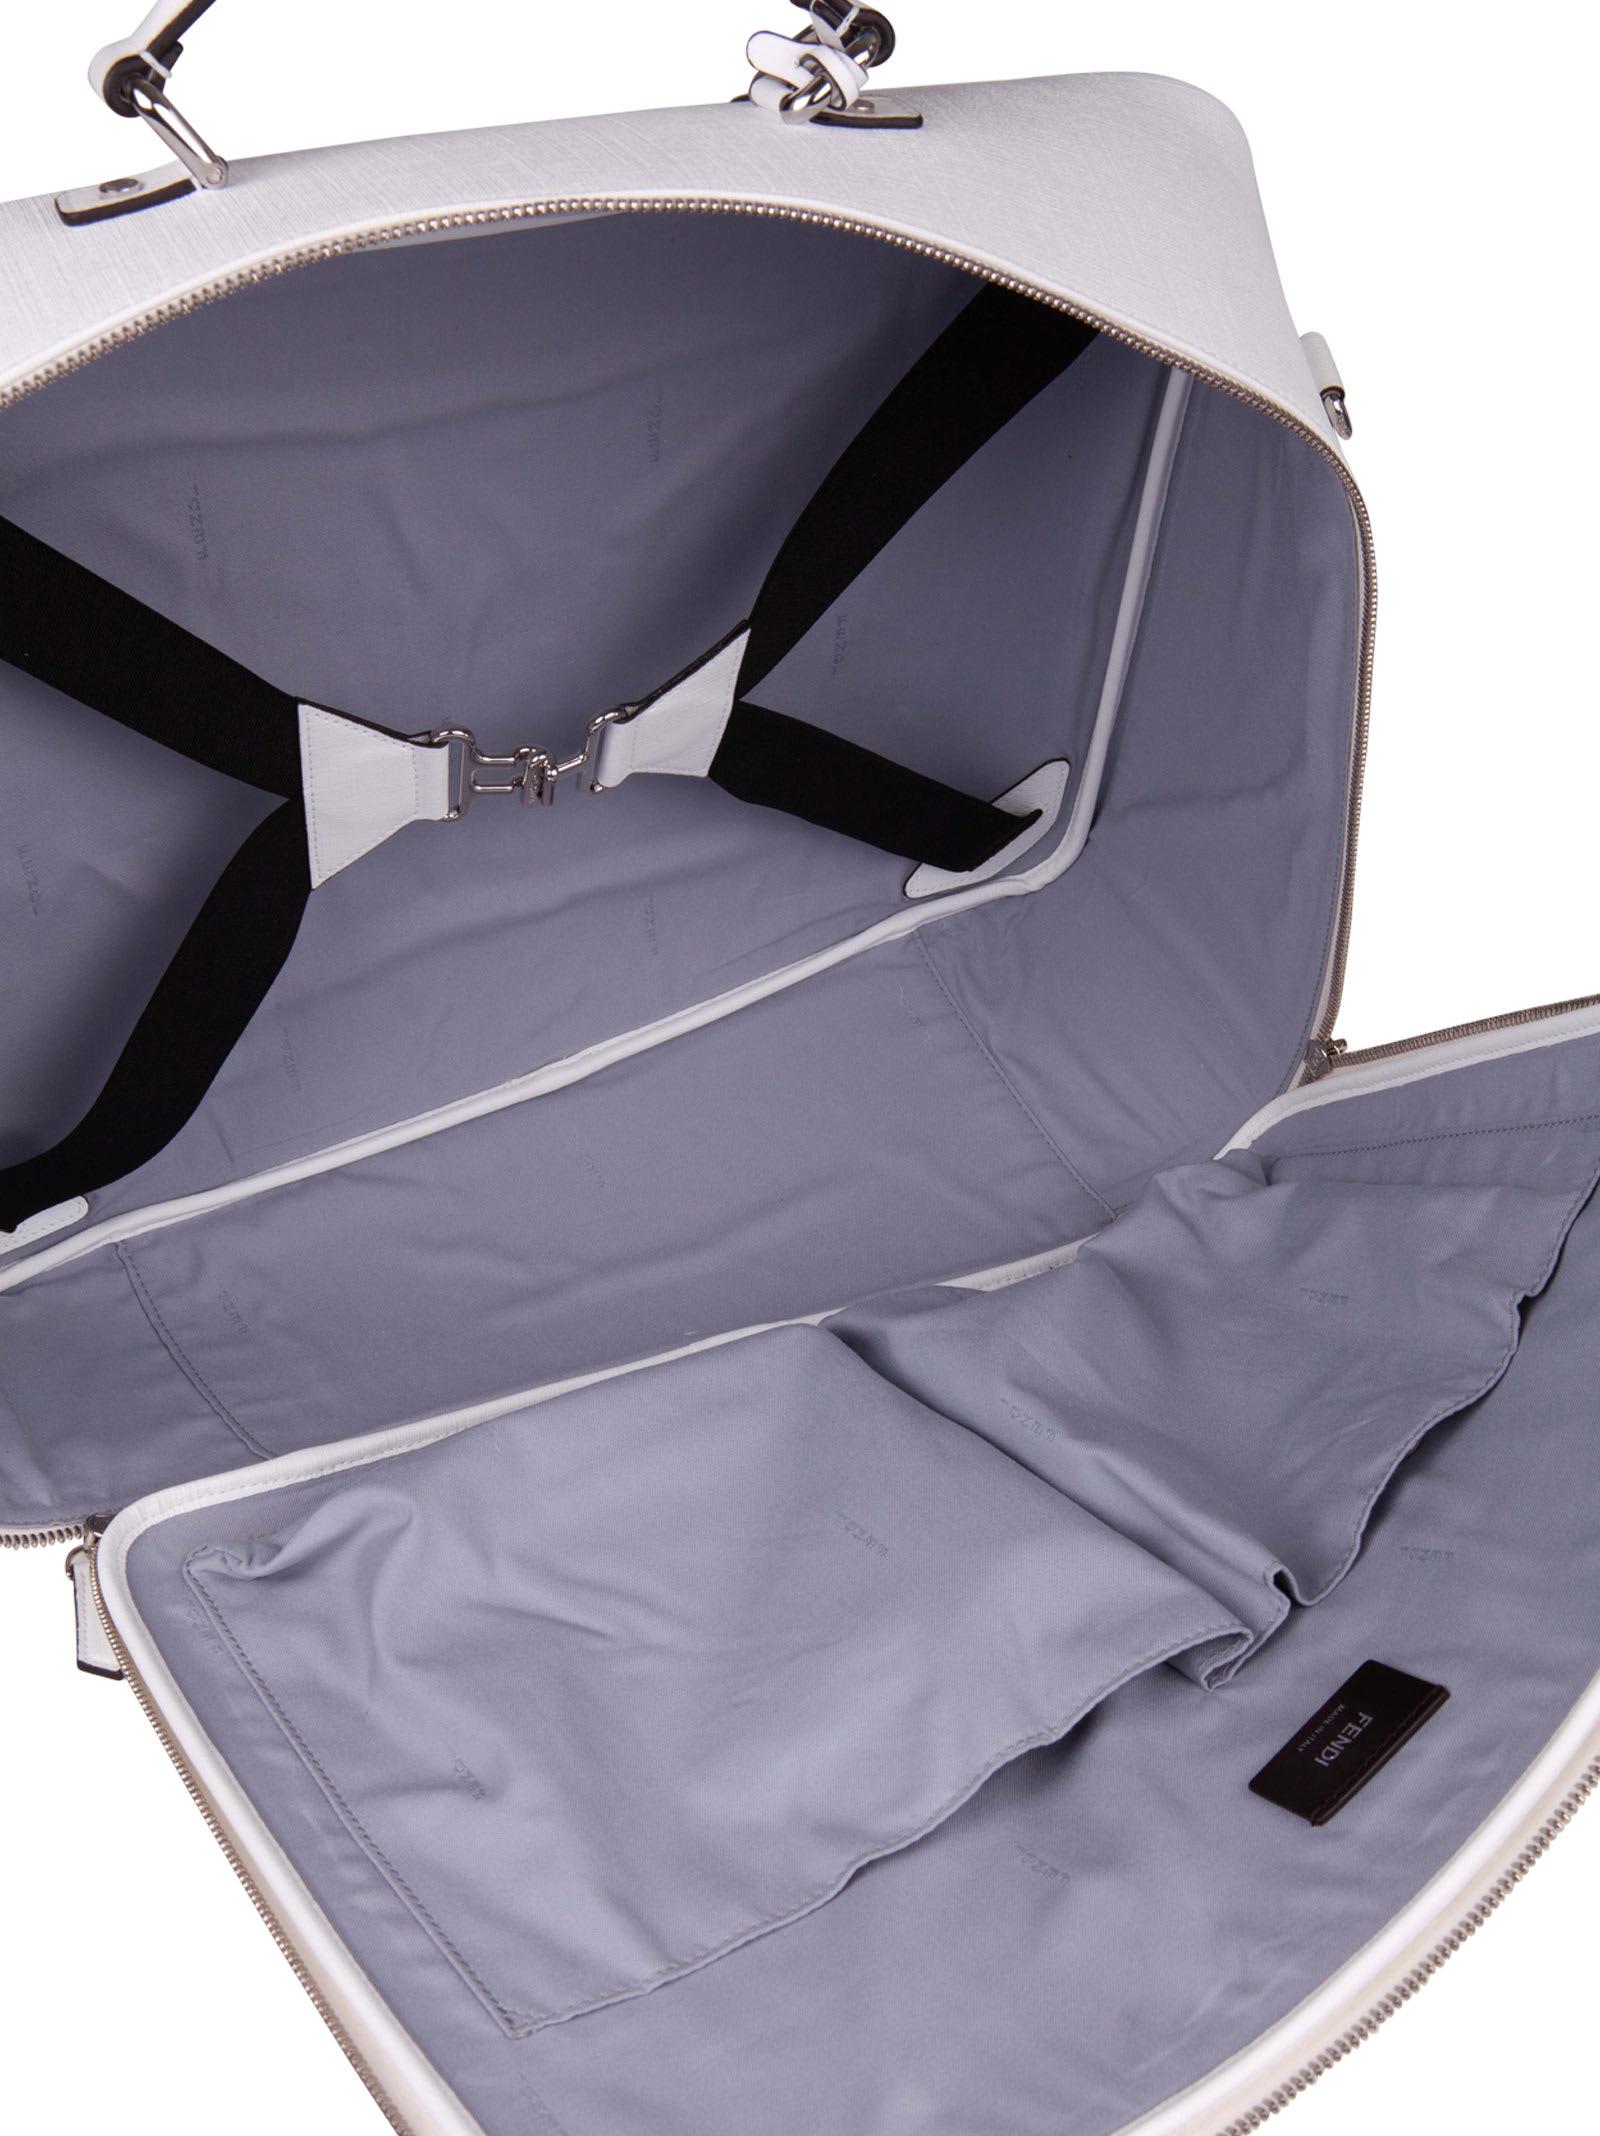 Enjoyable Fendi Fendi Kids Suitcase White 10907554 Italist Dailytribune Chair Design For Home Dailytribuneorg